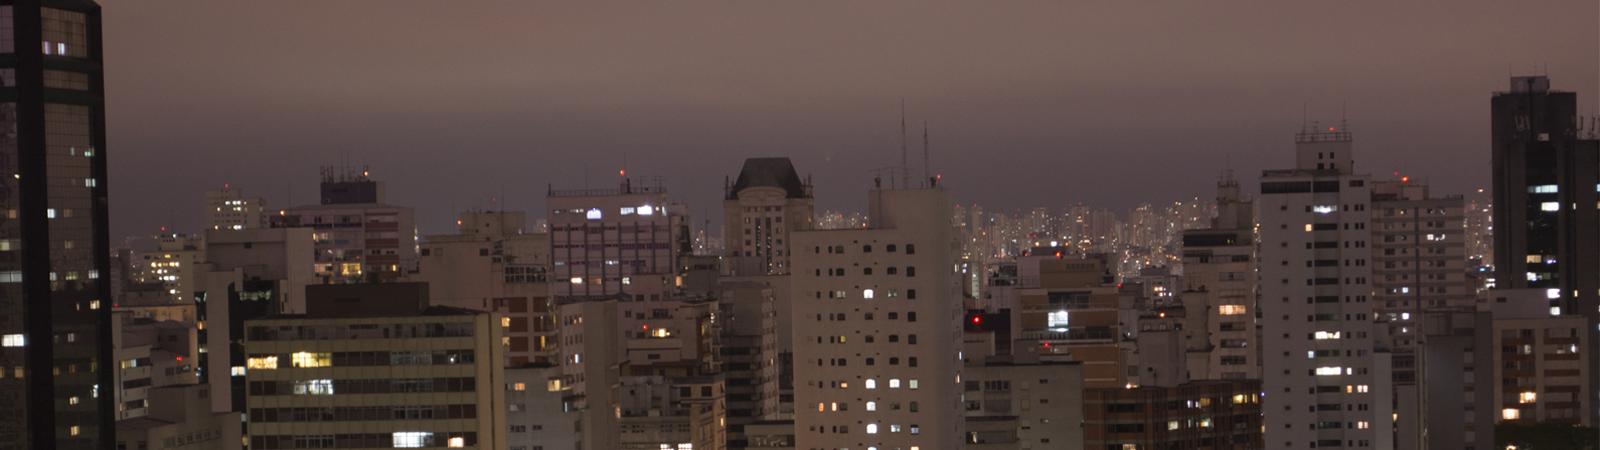 ATYPI São Paulo 2015